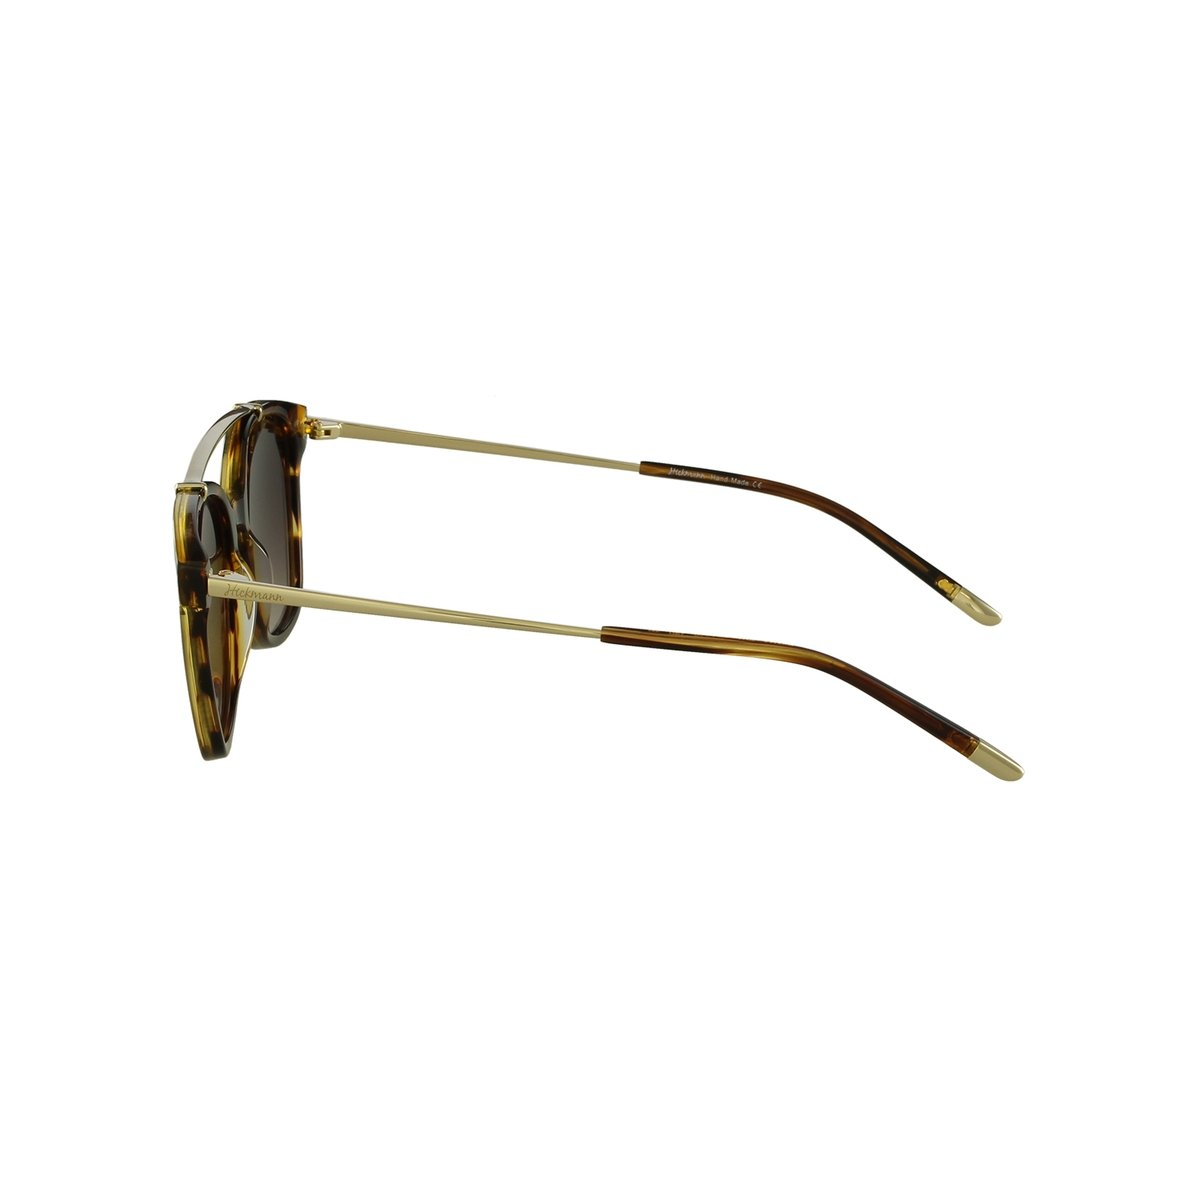 90590b49c7d79 Óculos De Sol Hickmann - Marrom - Compre Agora   Netshoes